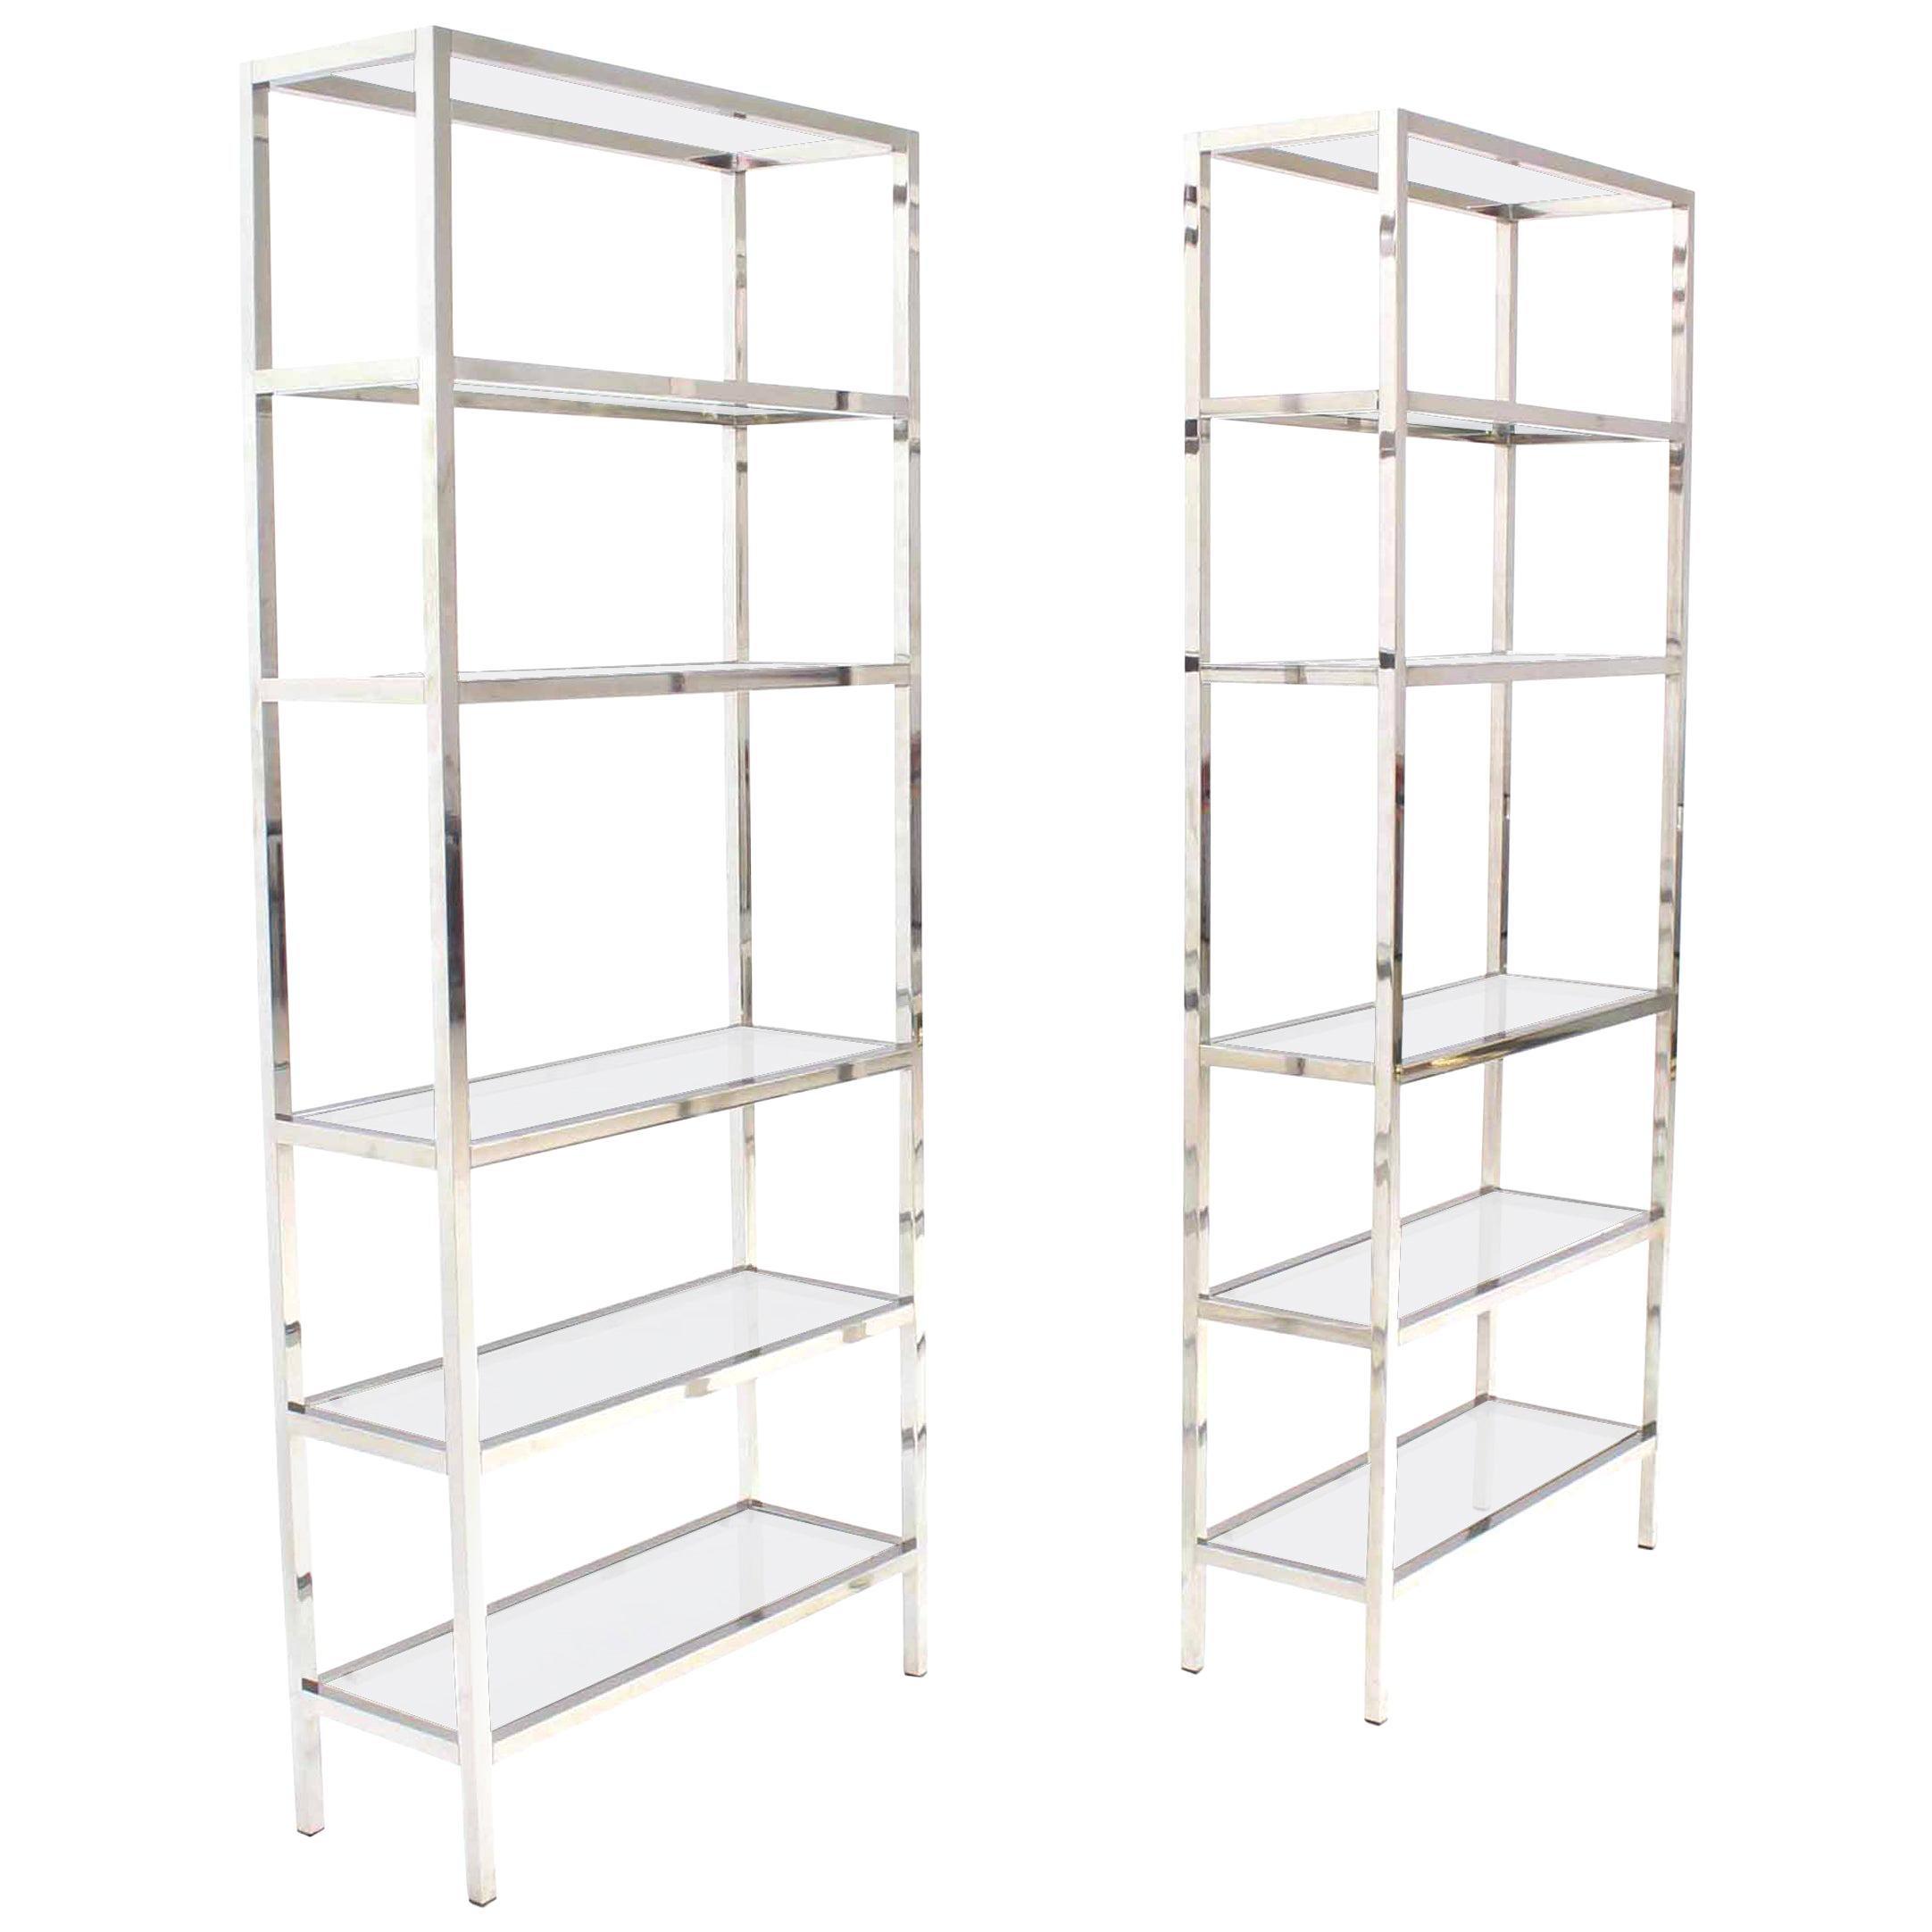 Pair of Tall Glass 6 Tier Shelves Chrome Étagerés